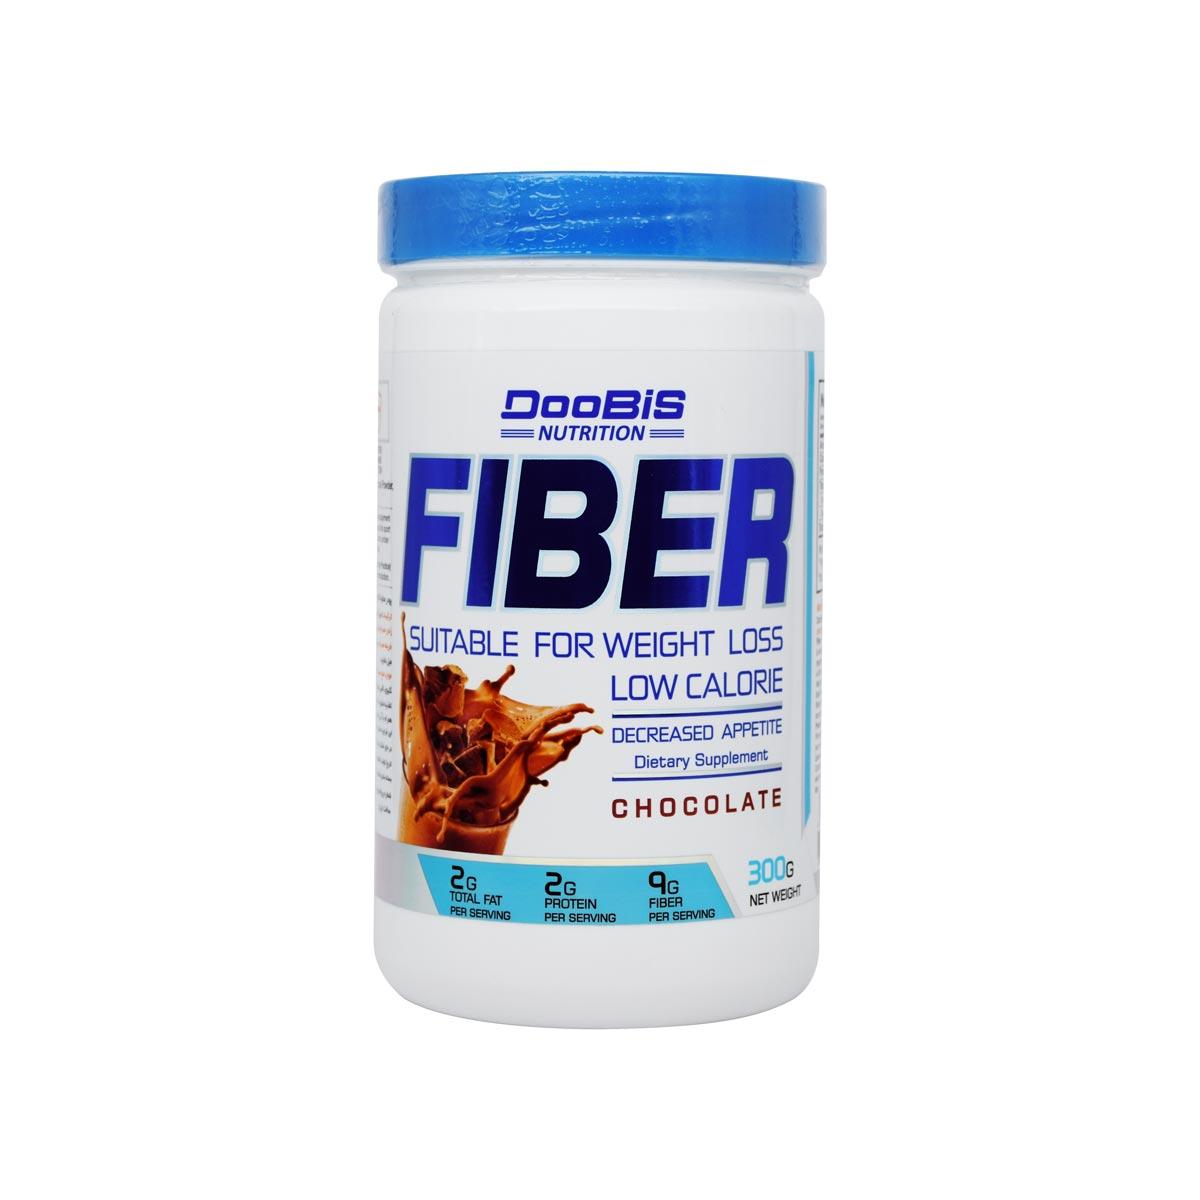 پودر فیبر دوبیس - 300 گرم